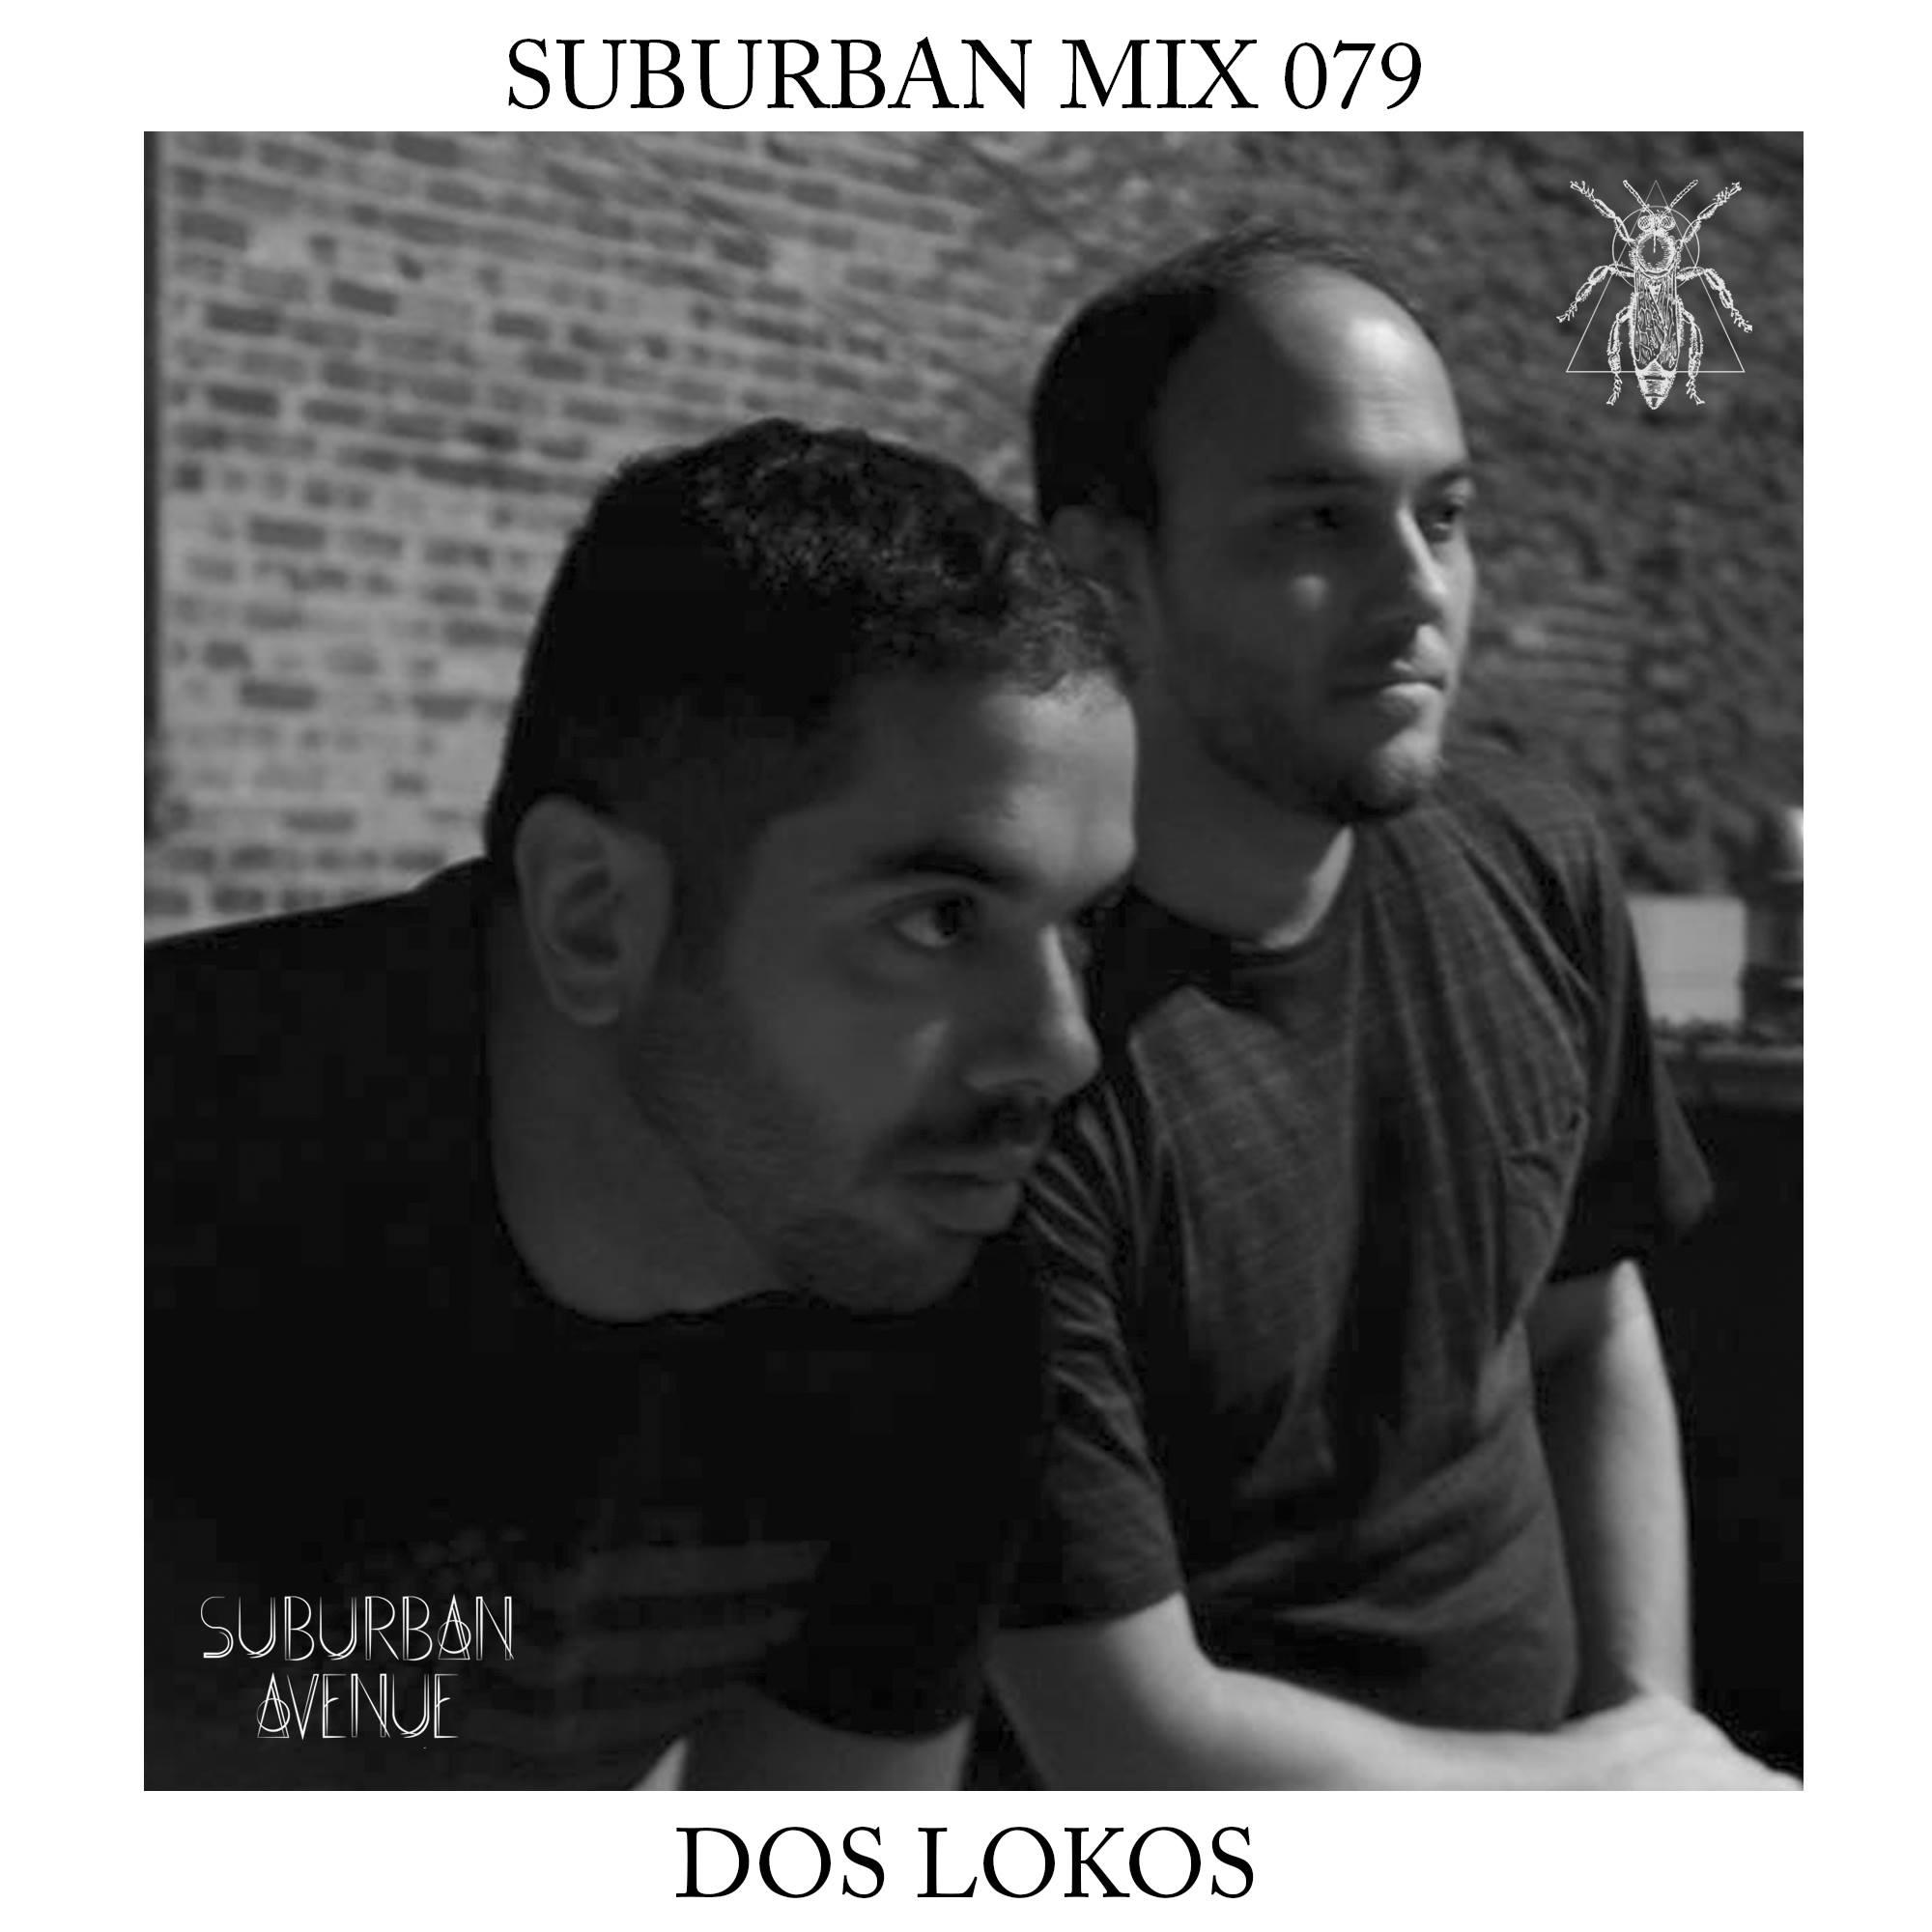 Suburban Mix 079 - Dos Lokos